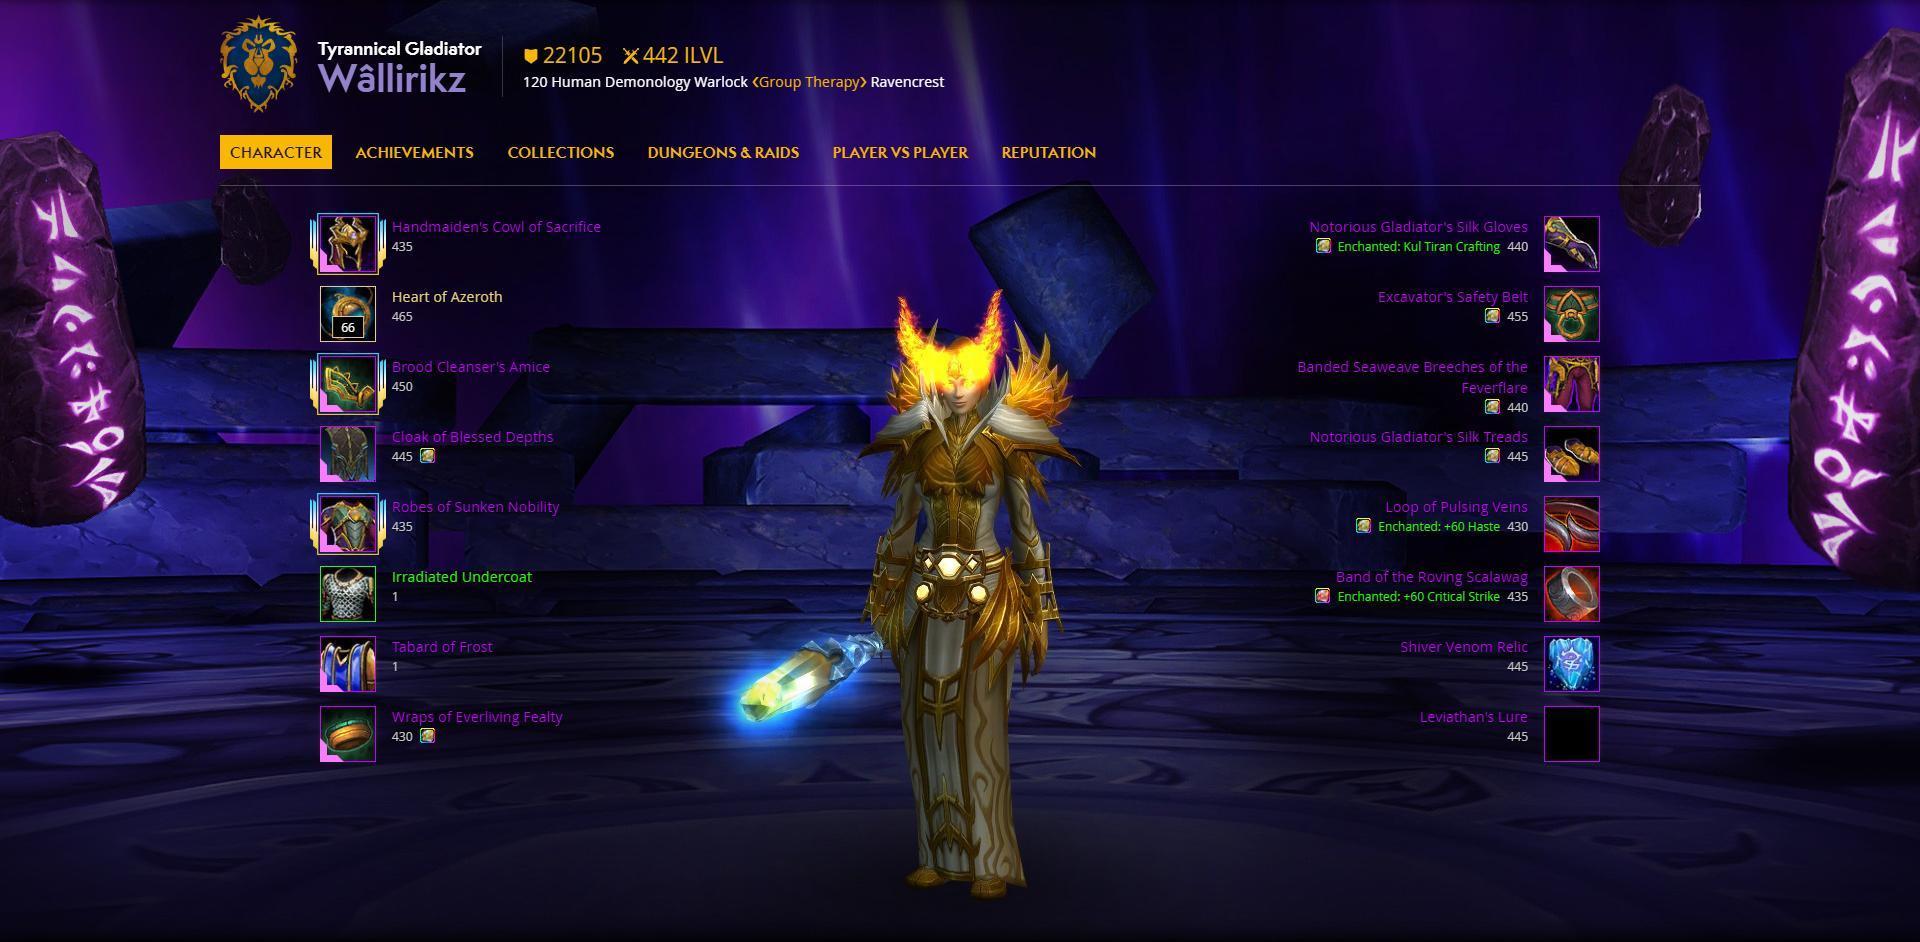 warlock skills in wow classic